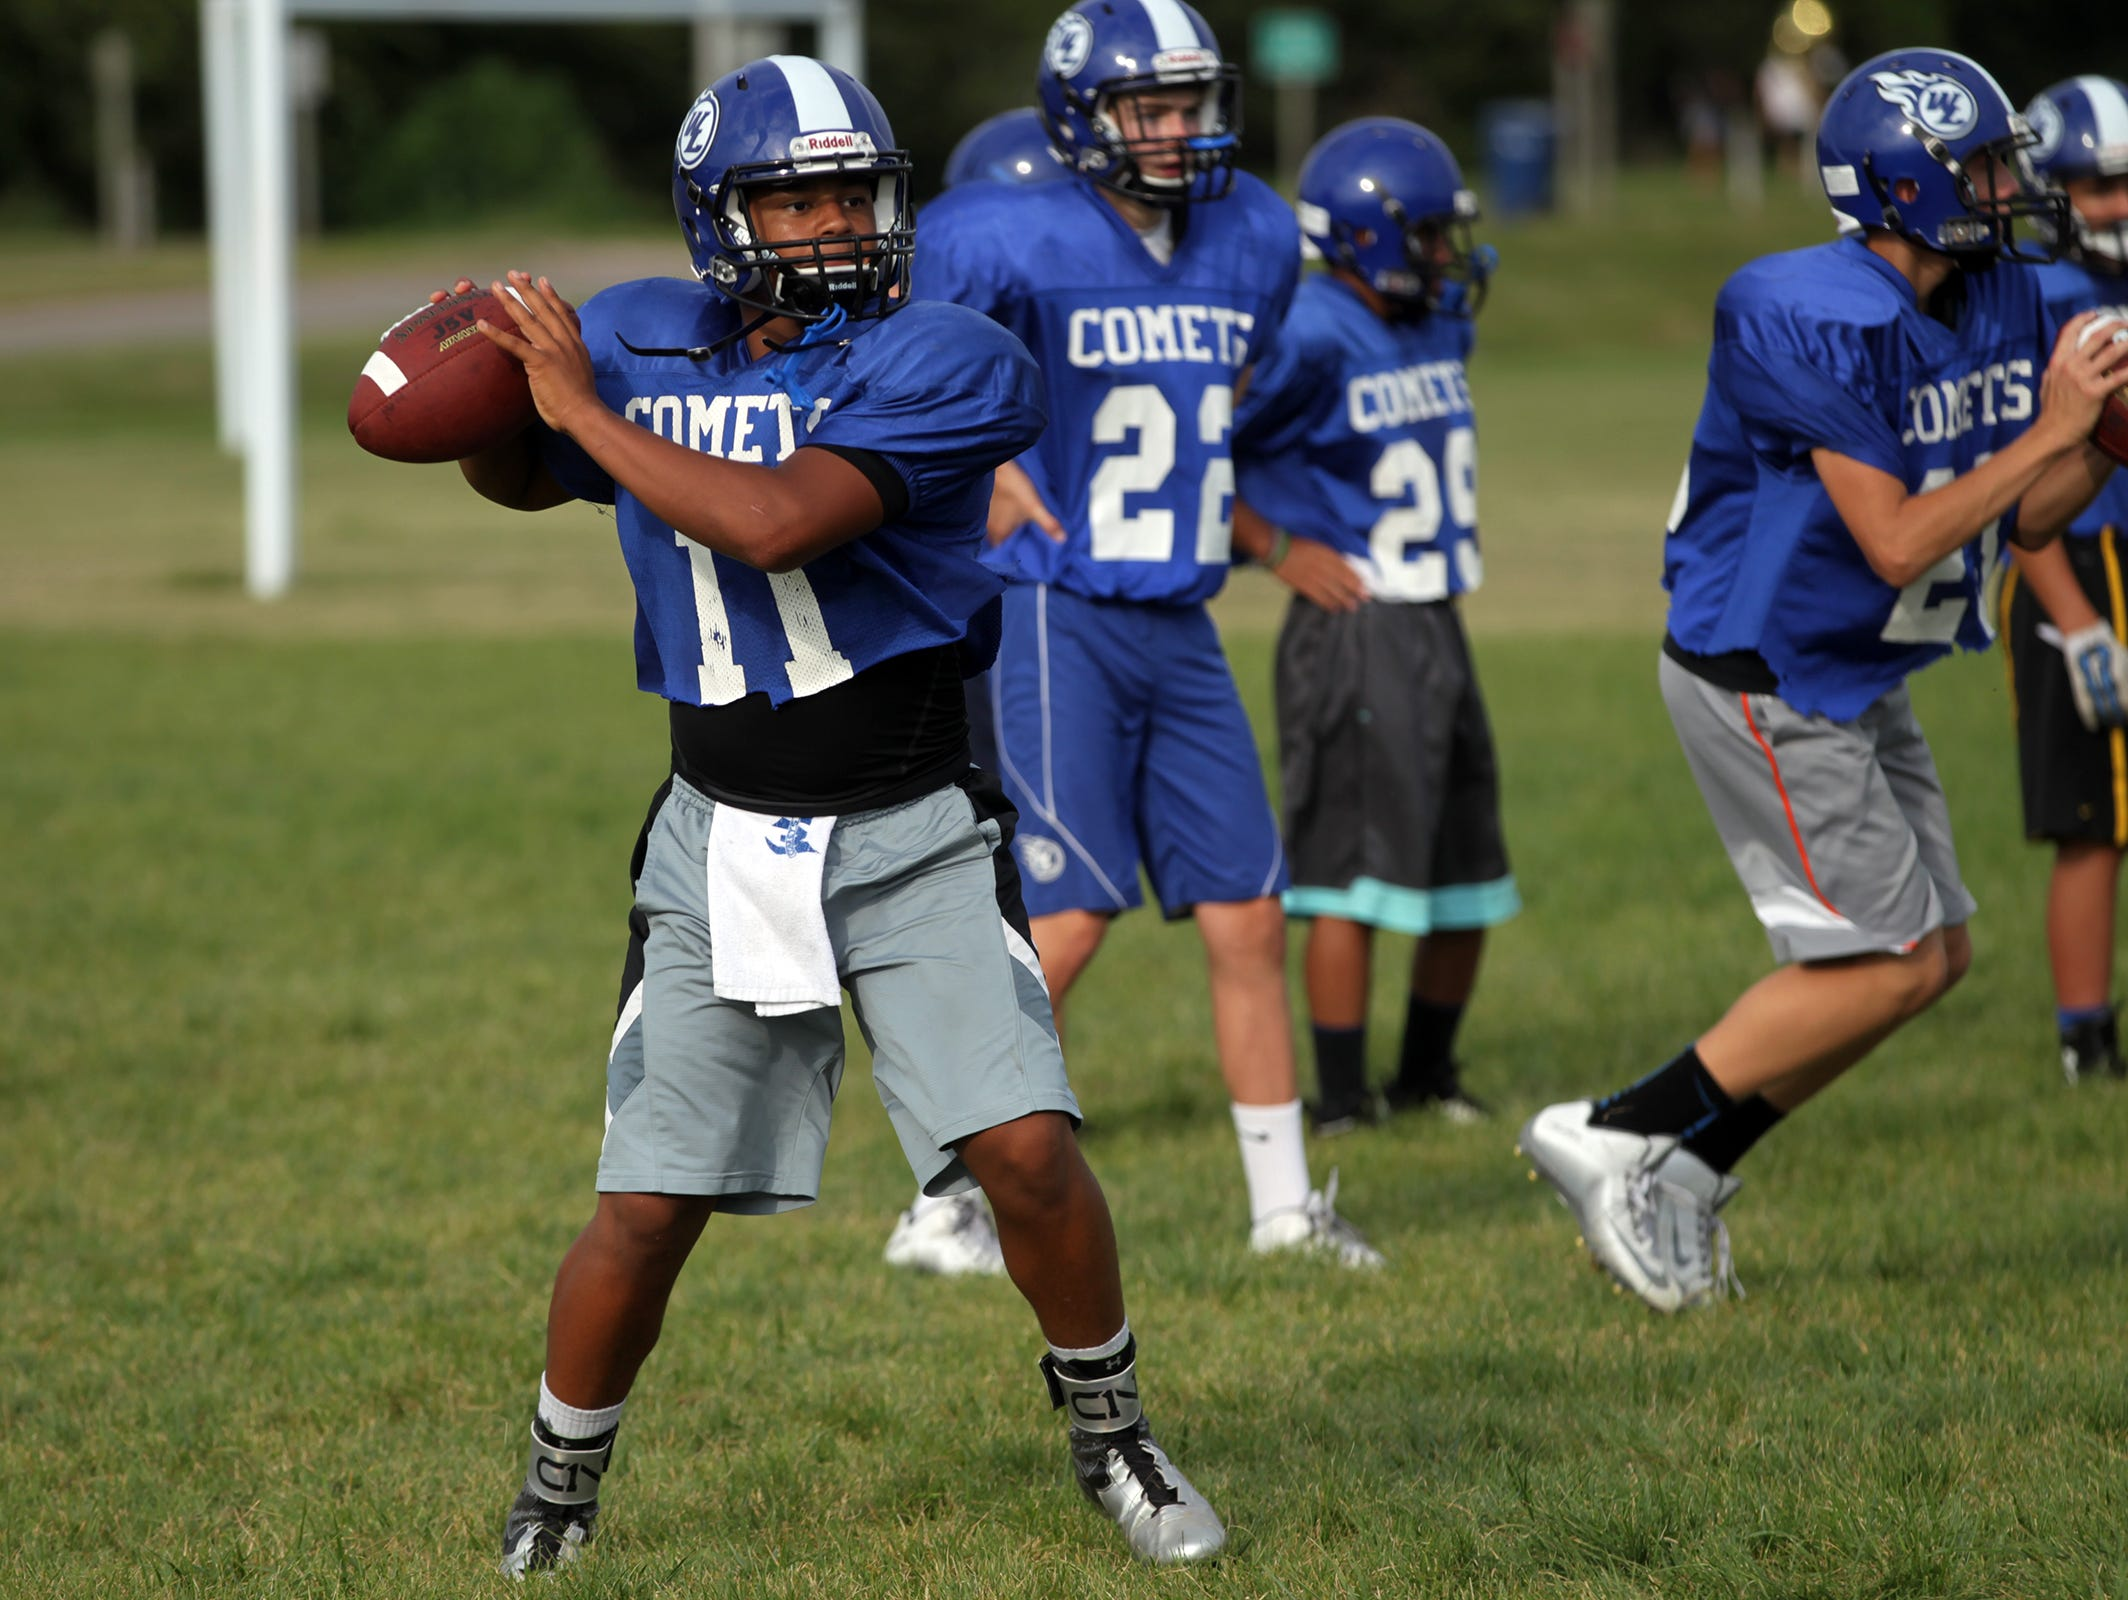 West Liberty senior quarterback Josh Walshire throws a pass during practice on Thursday, Aug. 13, 2015. David Scrivner / Iowa City Press-Citizen